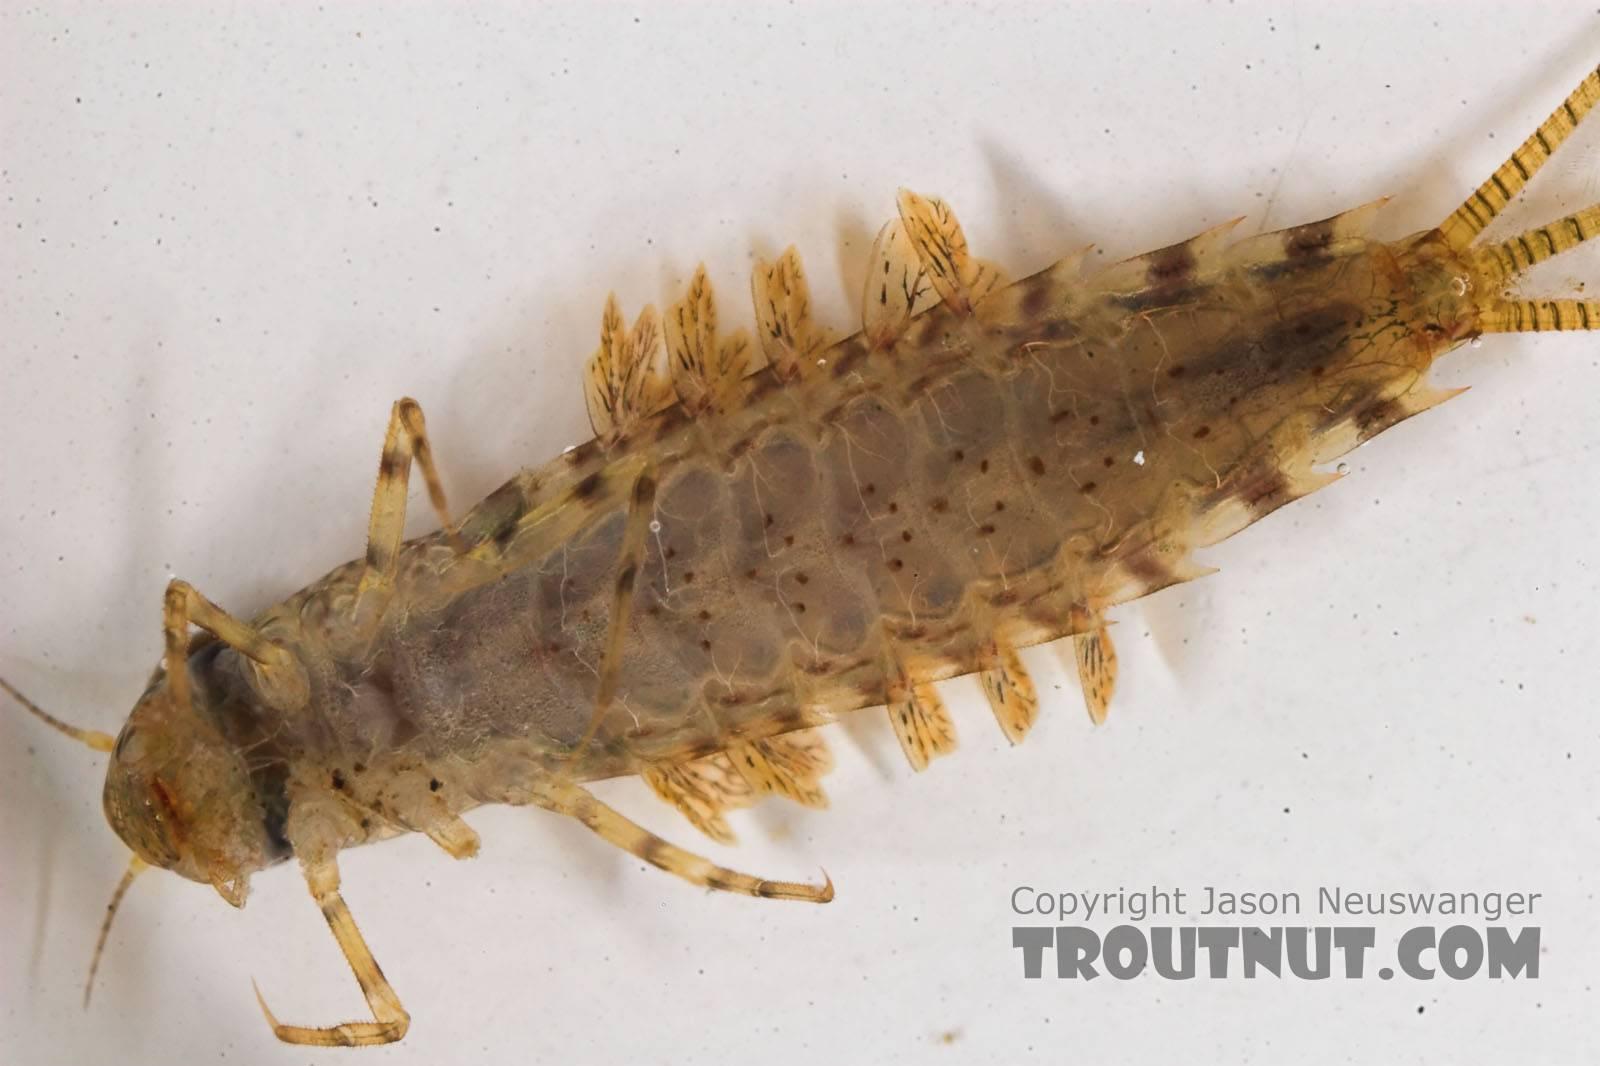 Siphlonurus alternatus (Gray Drake) Mayfly Nymph from the Namekagon River in Wisconsin